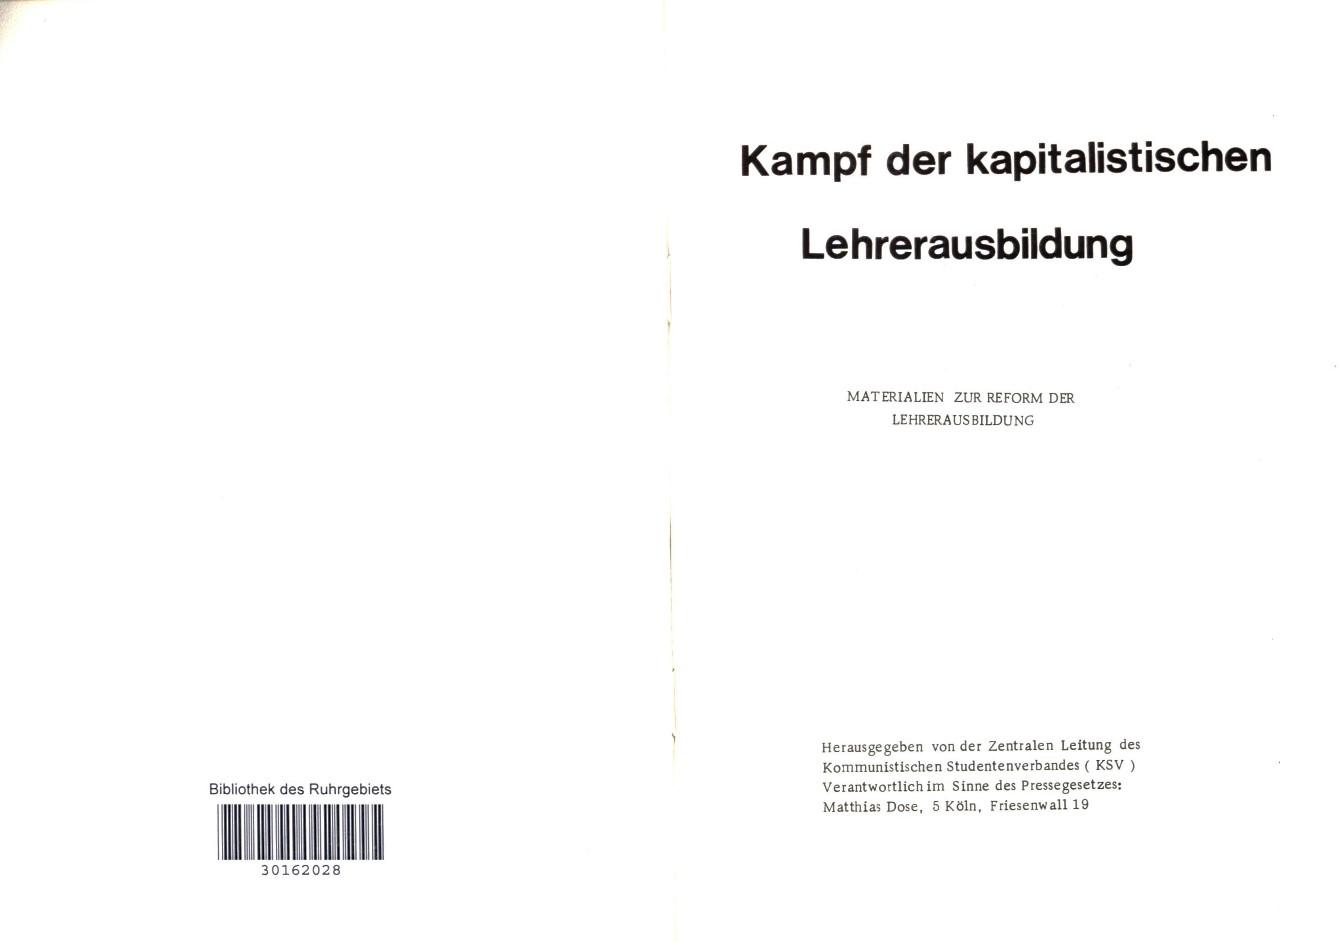 KSV_1975_Lehrerausbildung_02